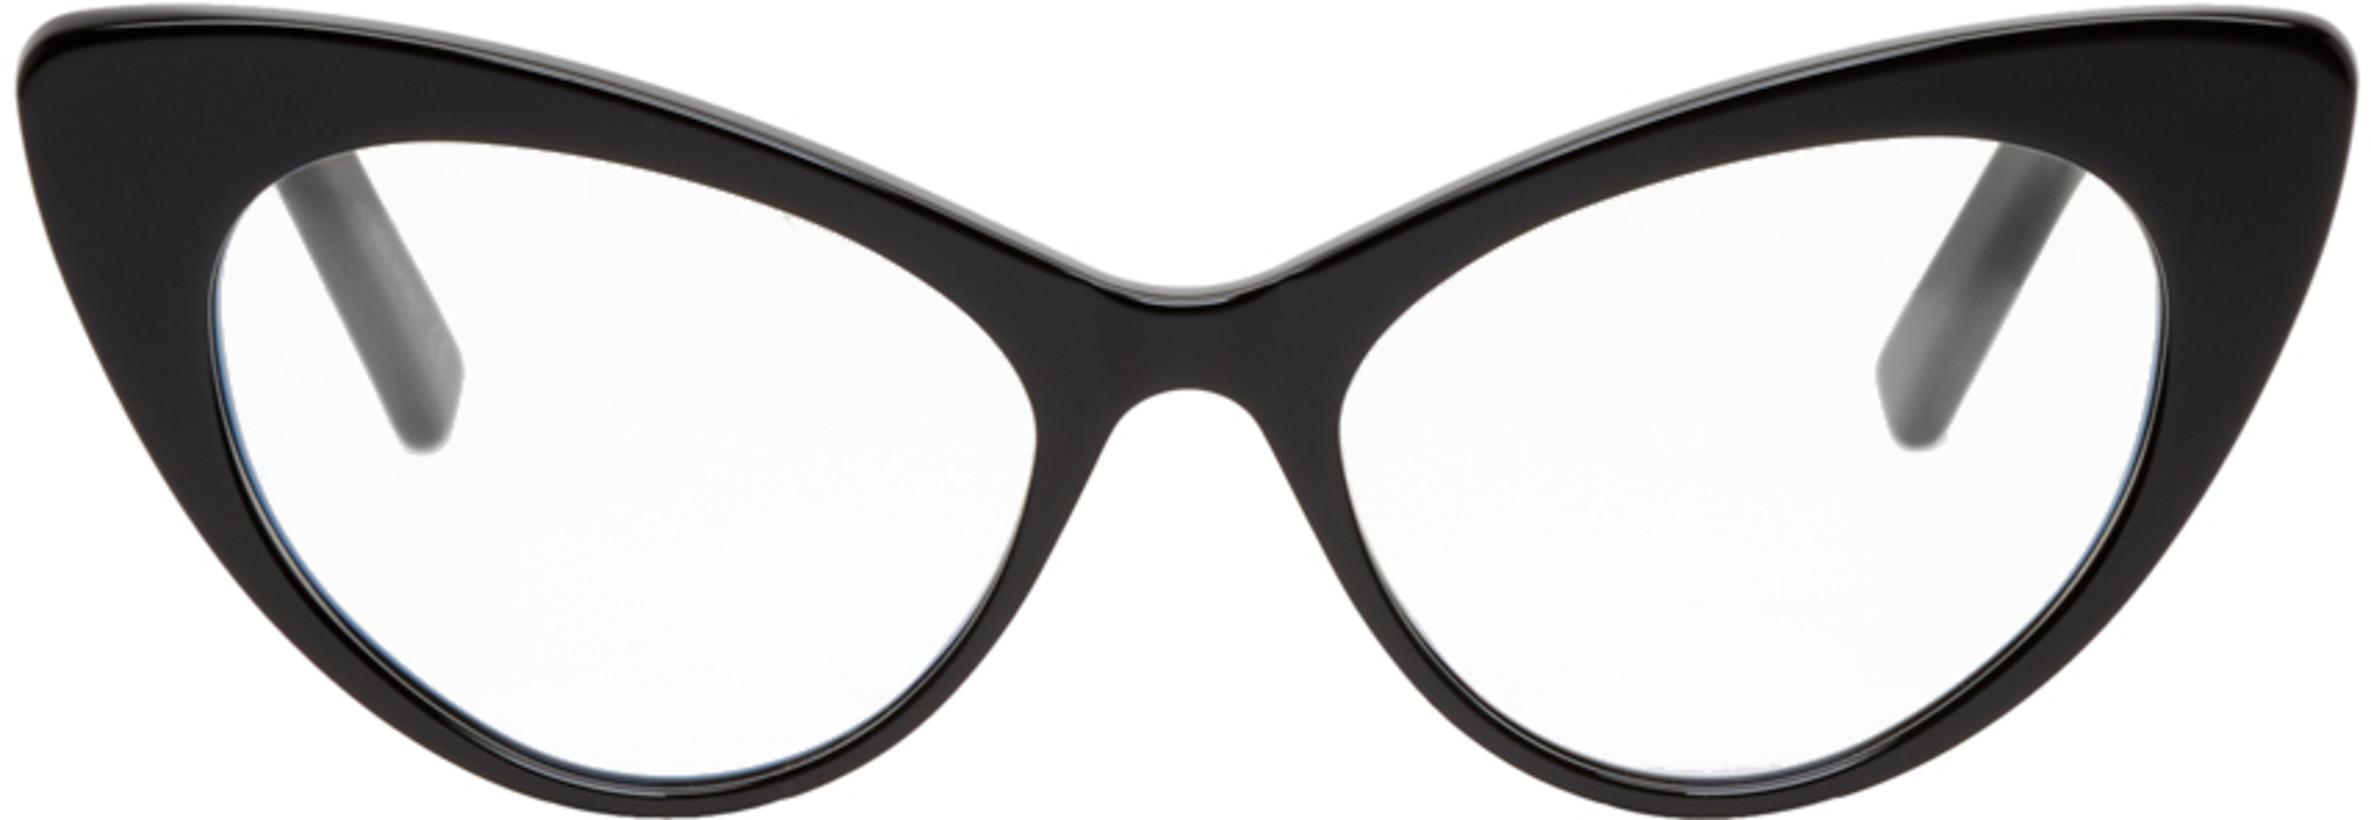 Saint Laurent Black Bold Cat-Eye Glasses